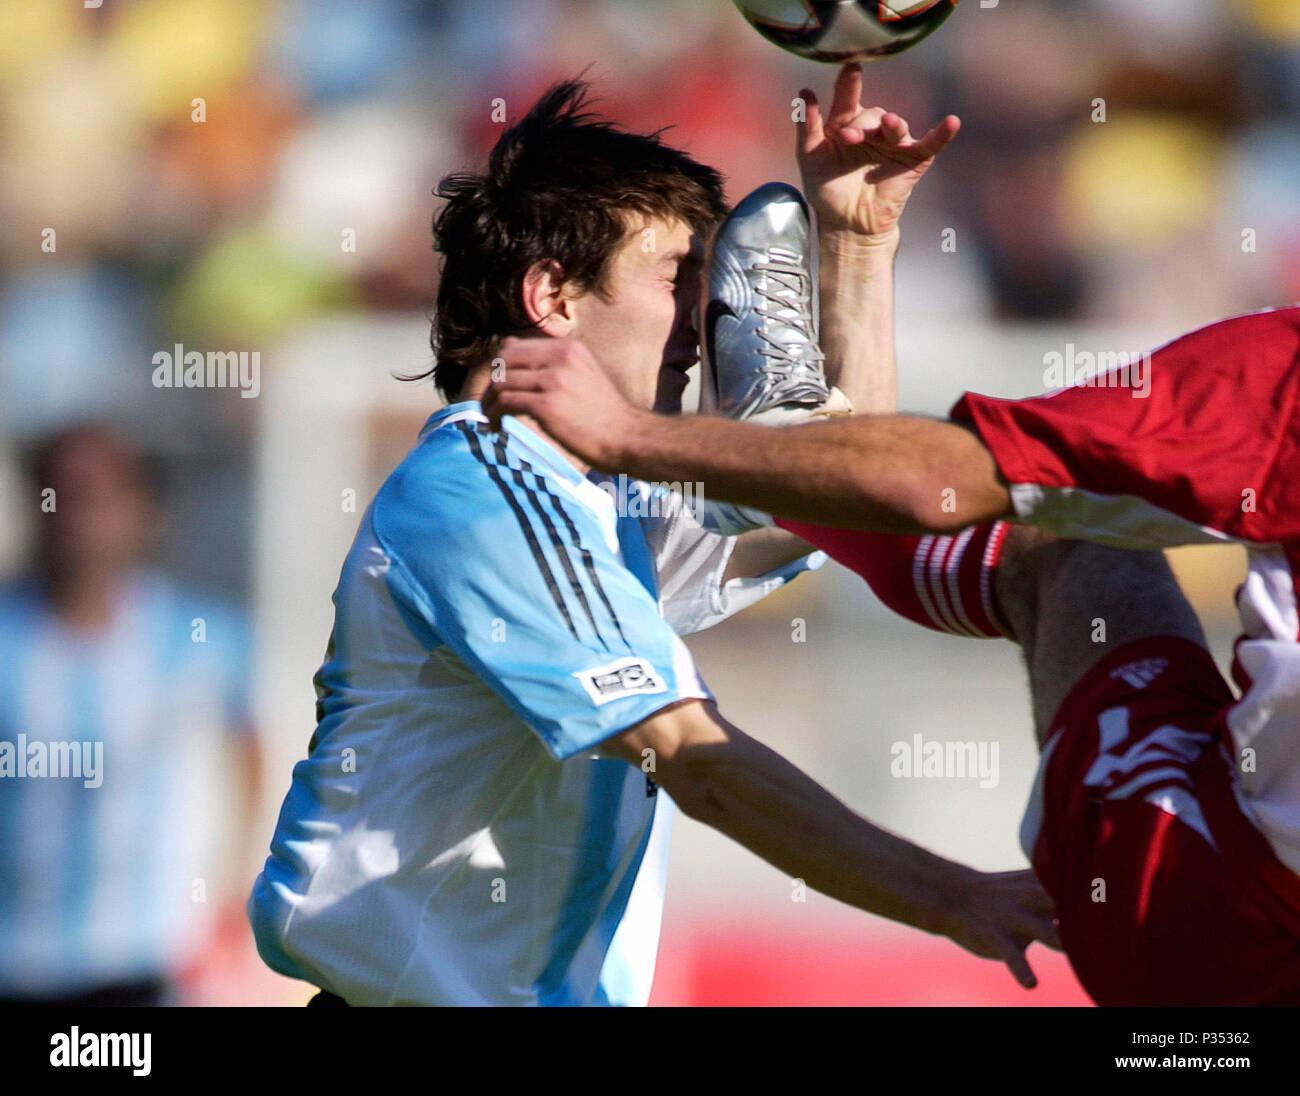 Arke Stadion Enschede, The Netherlands 14.6.2005, FIFA World Youth Championship, Egypt - Argentina 0:2 ---  Lionel MESSI  (ARG) - Stock Image